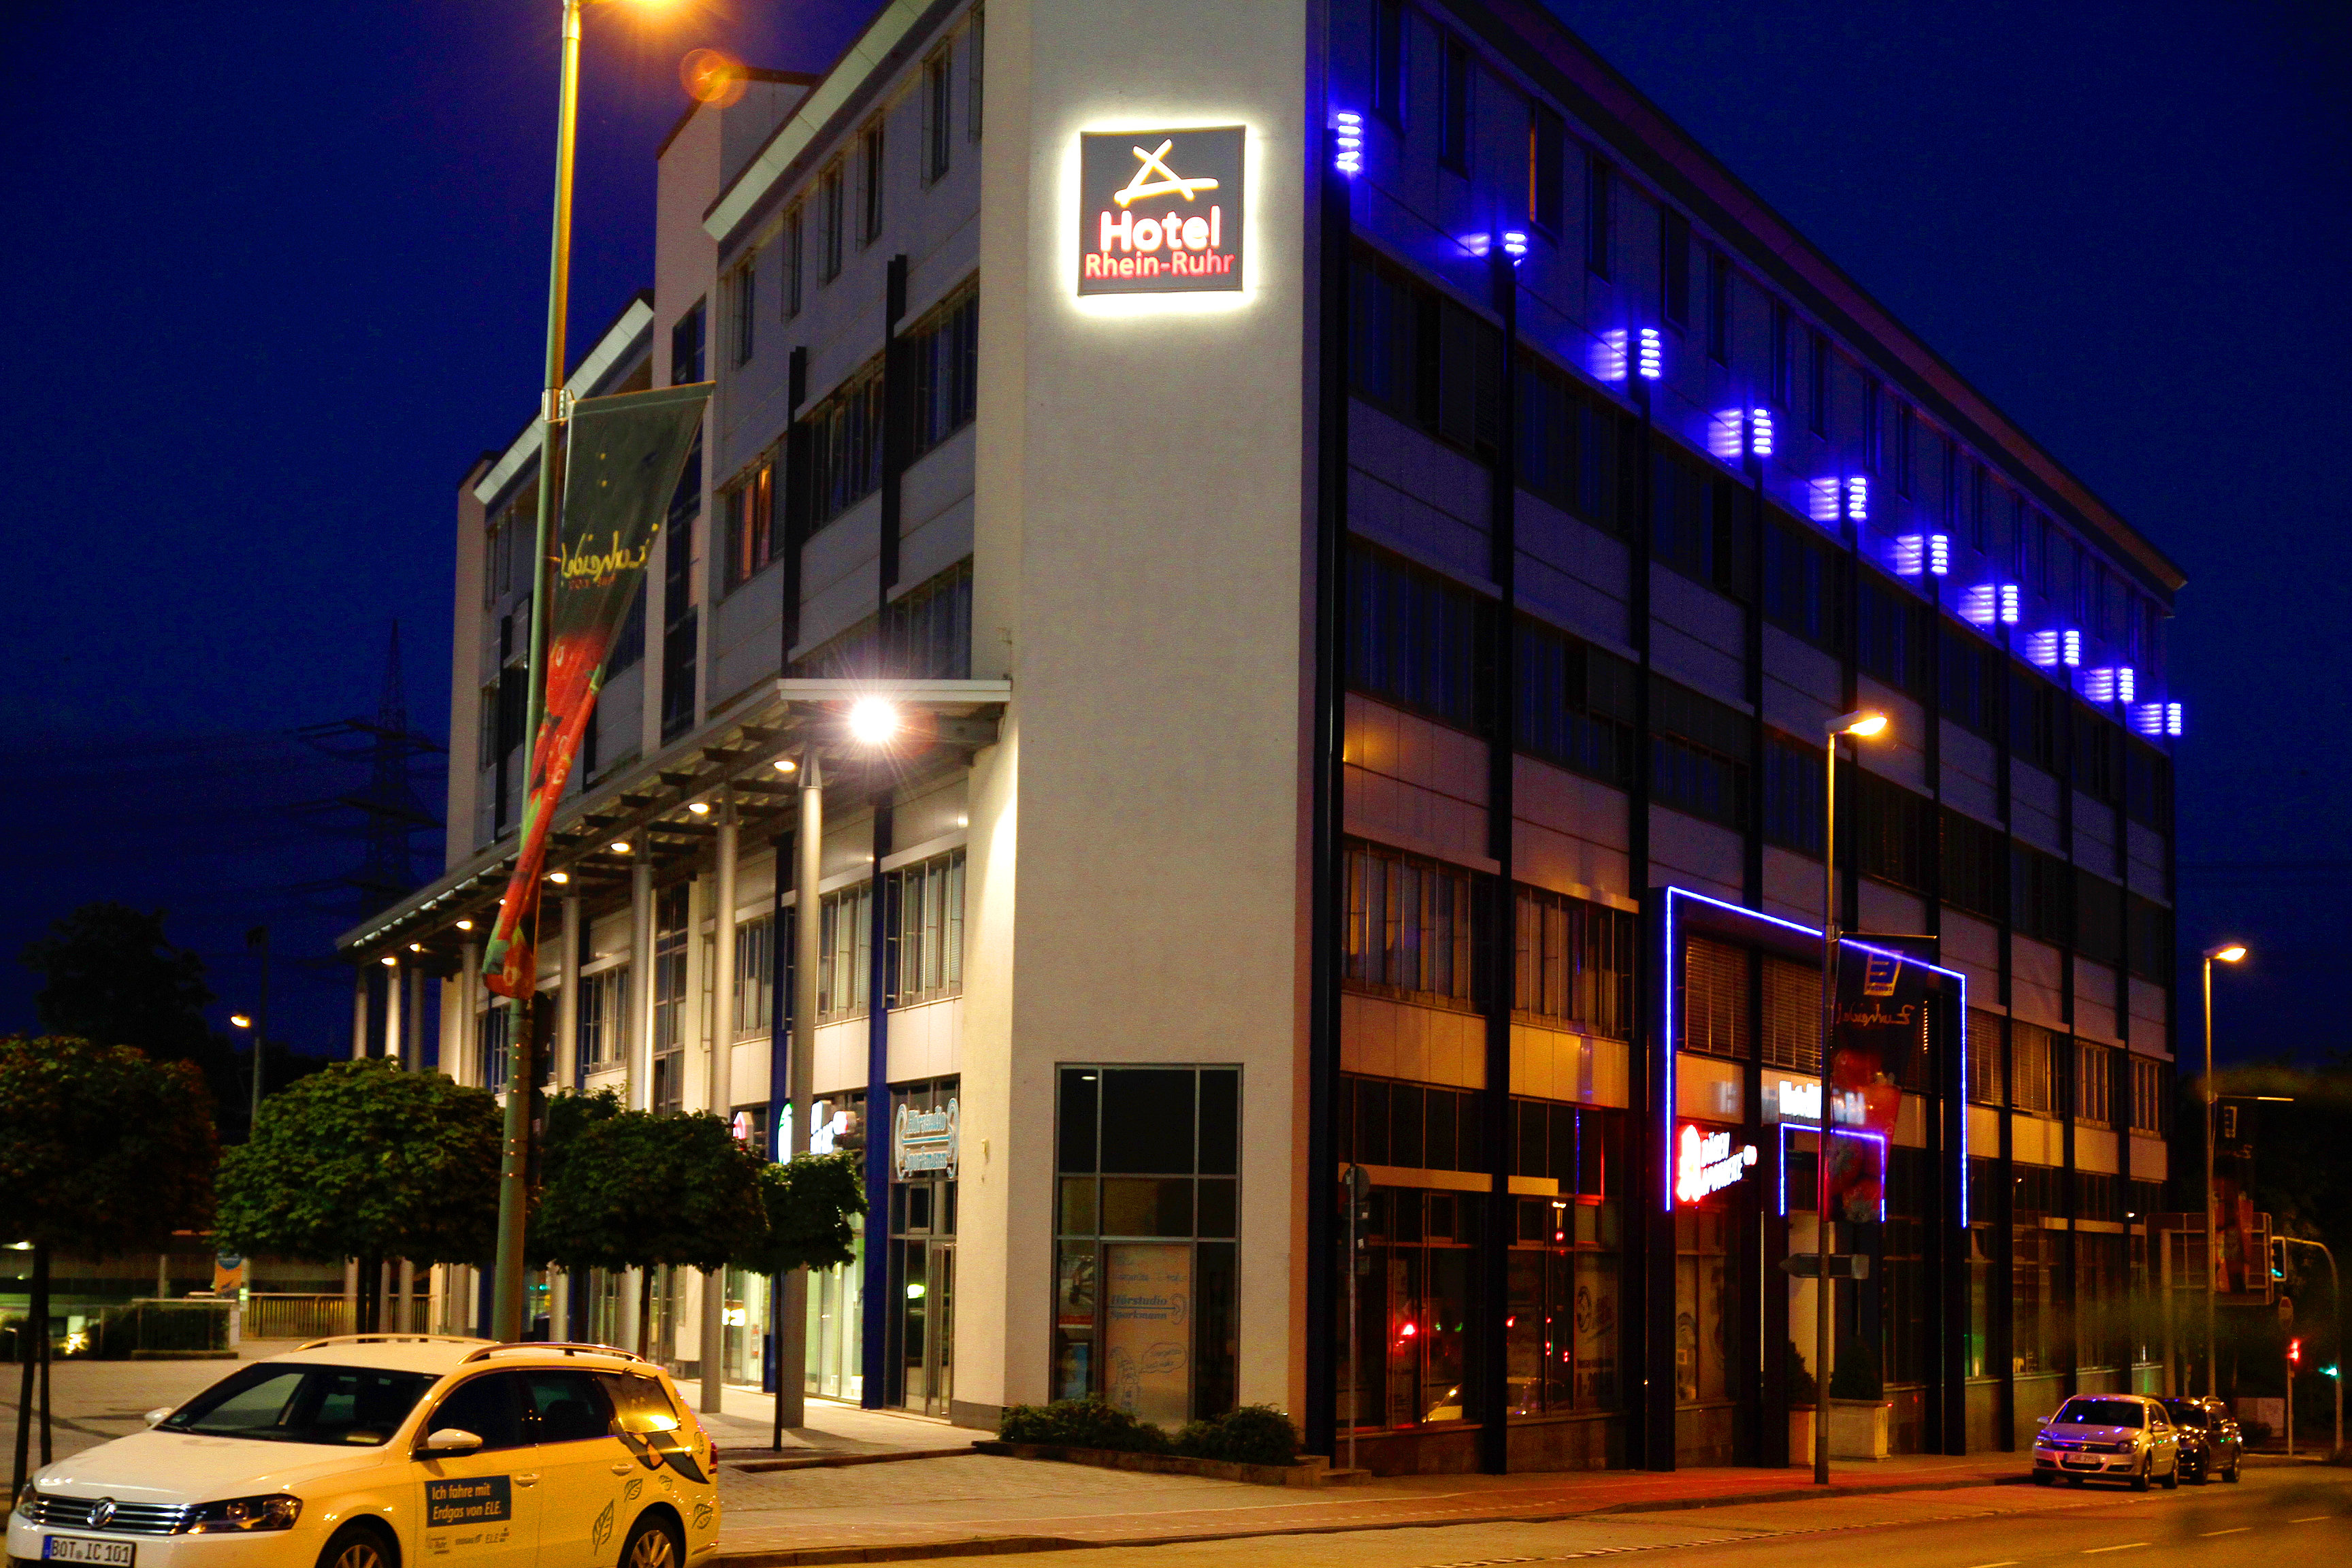 1 stern hotel in recklinghausen: